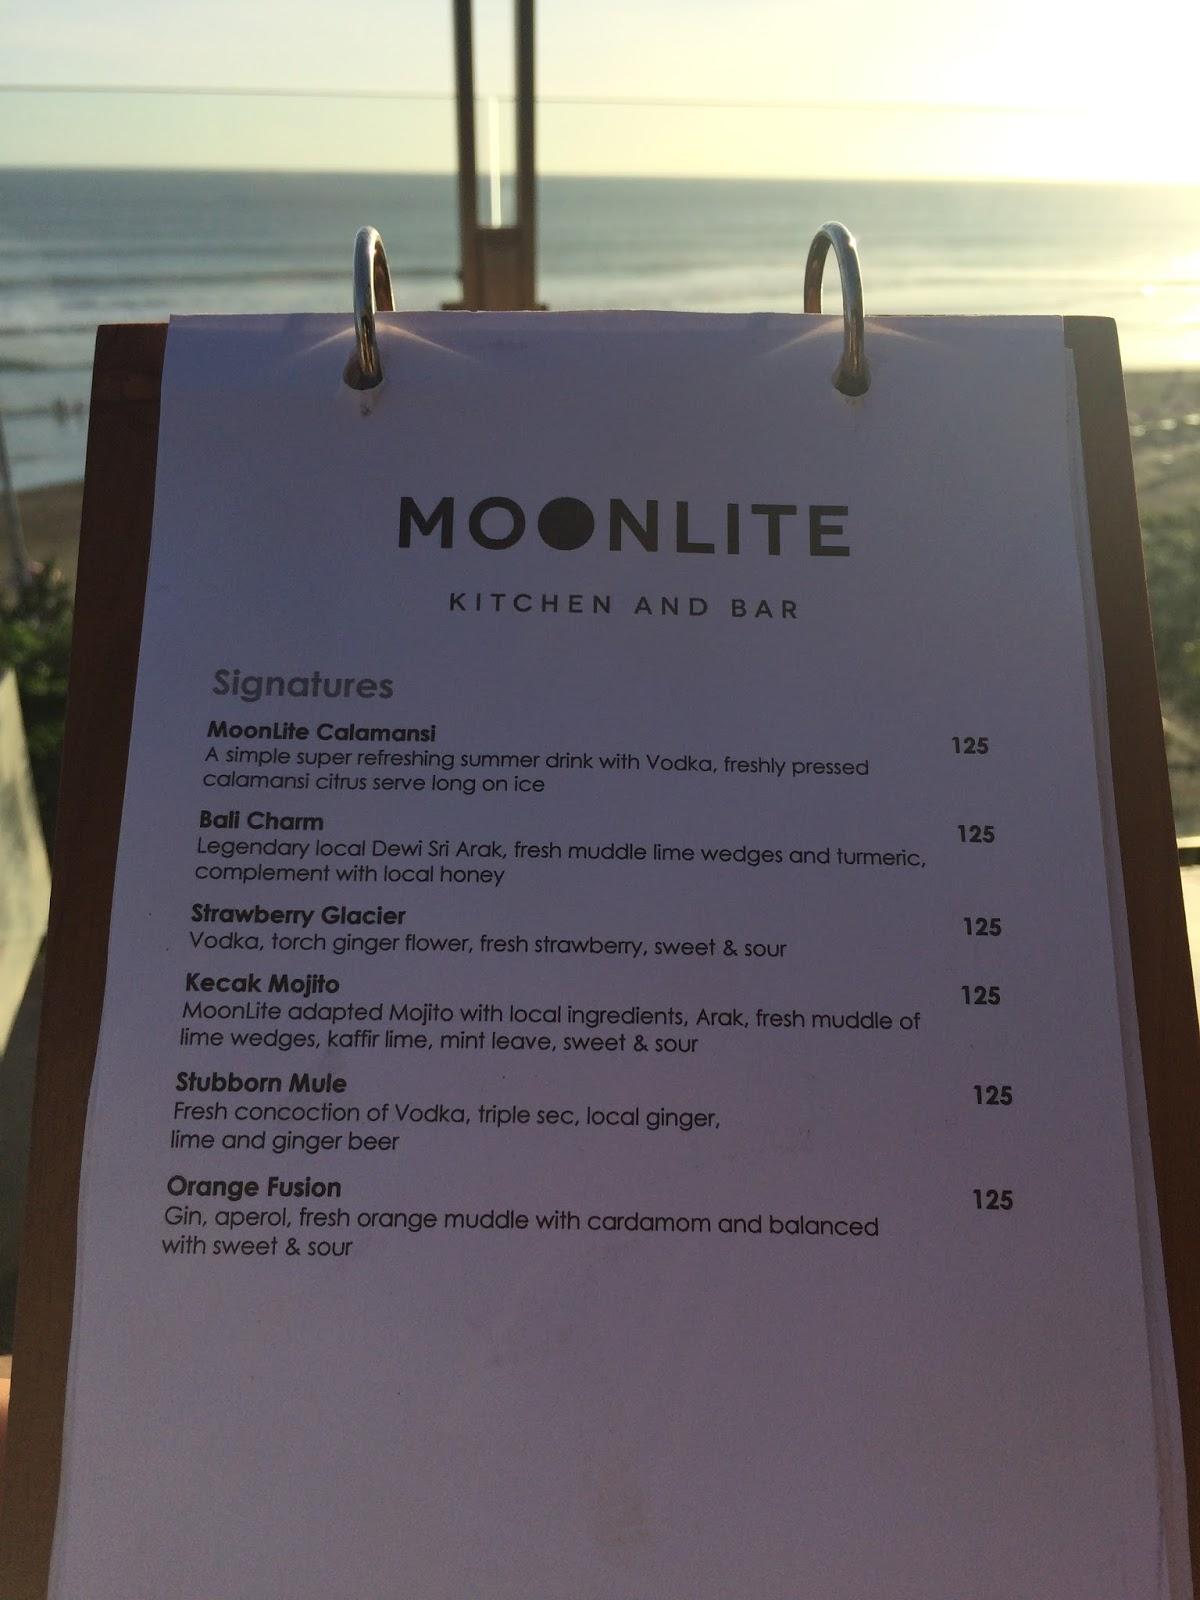 Moonlite Kitchen and Bar   Seminyak, Bali   Travel is my favorite ...